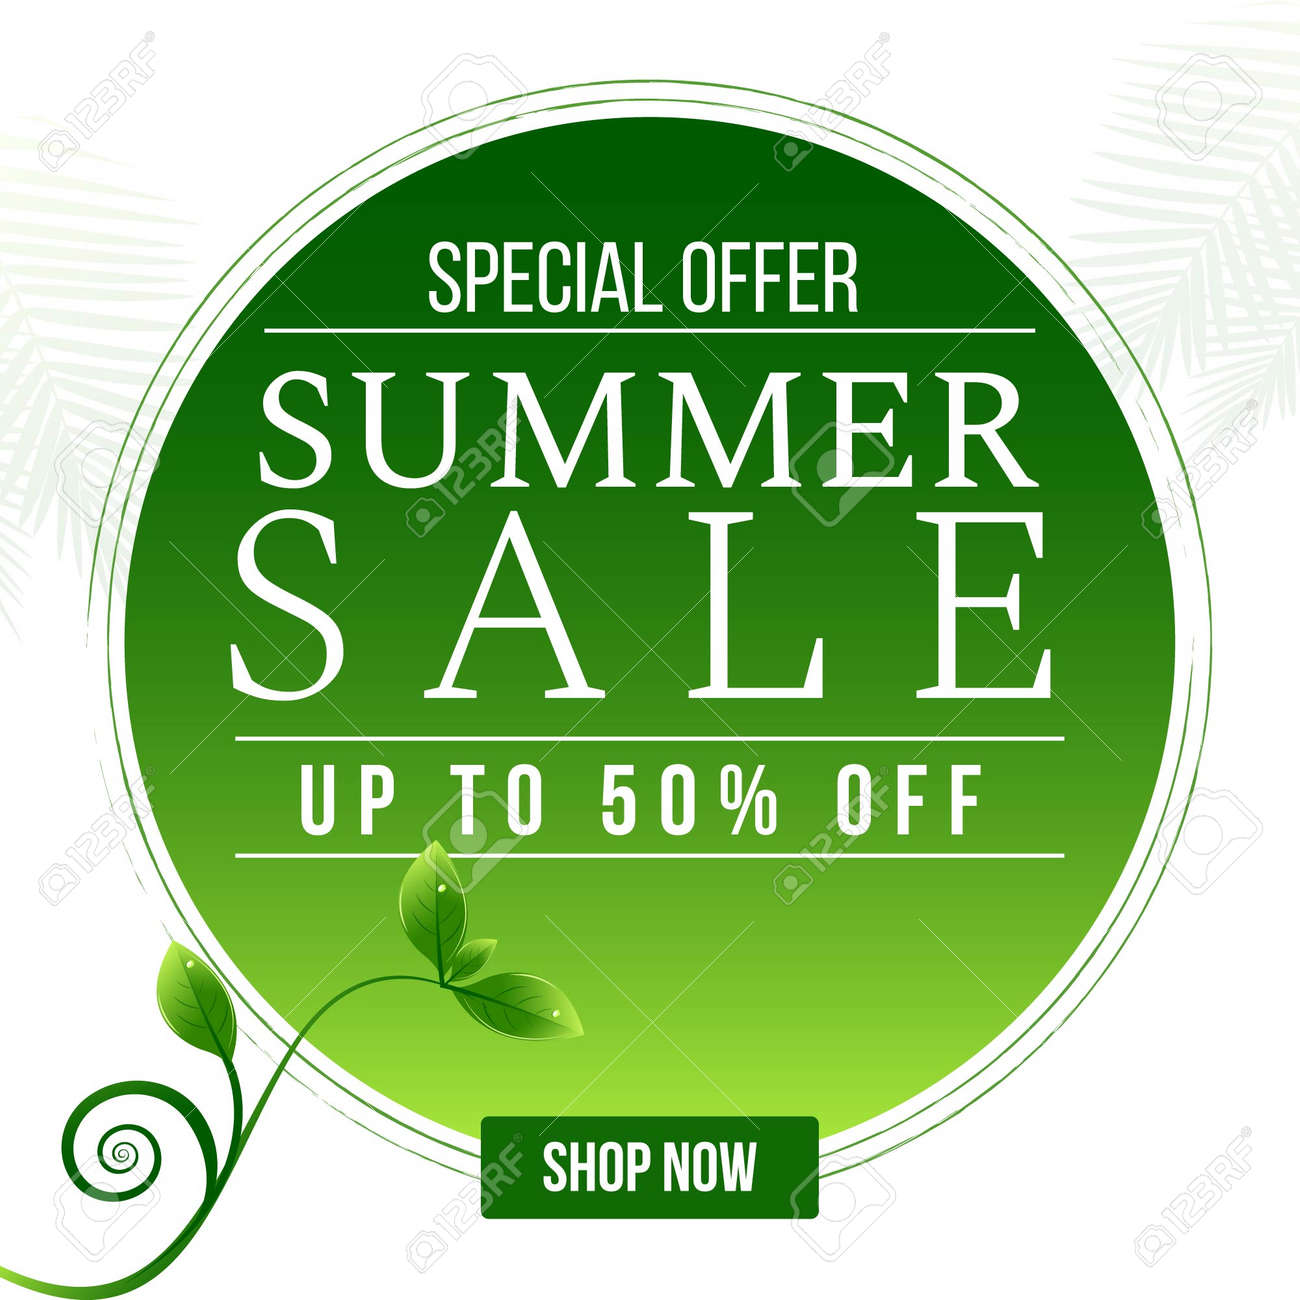 Special offer summer sale banner design template. Vector graphic illustration. - 171677622